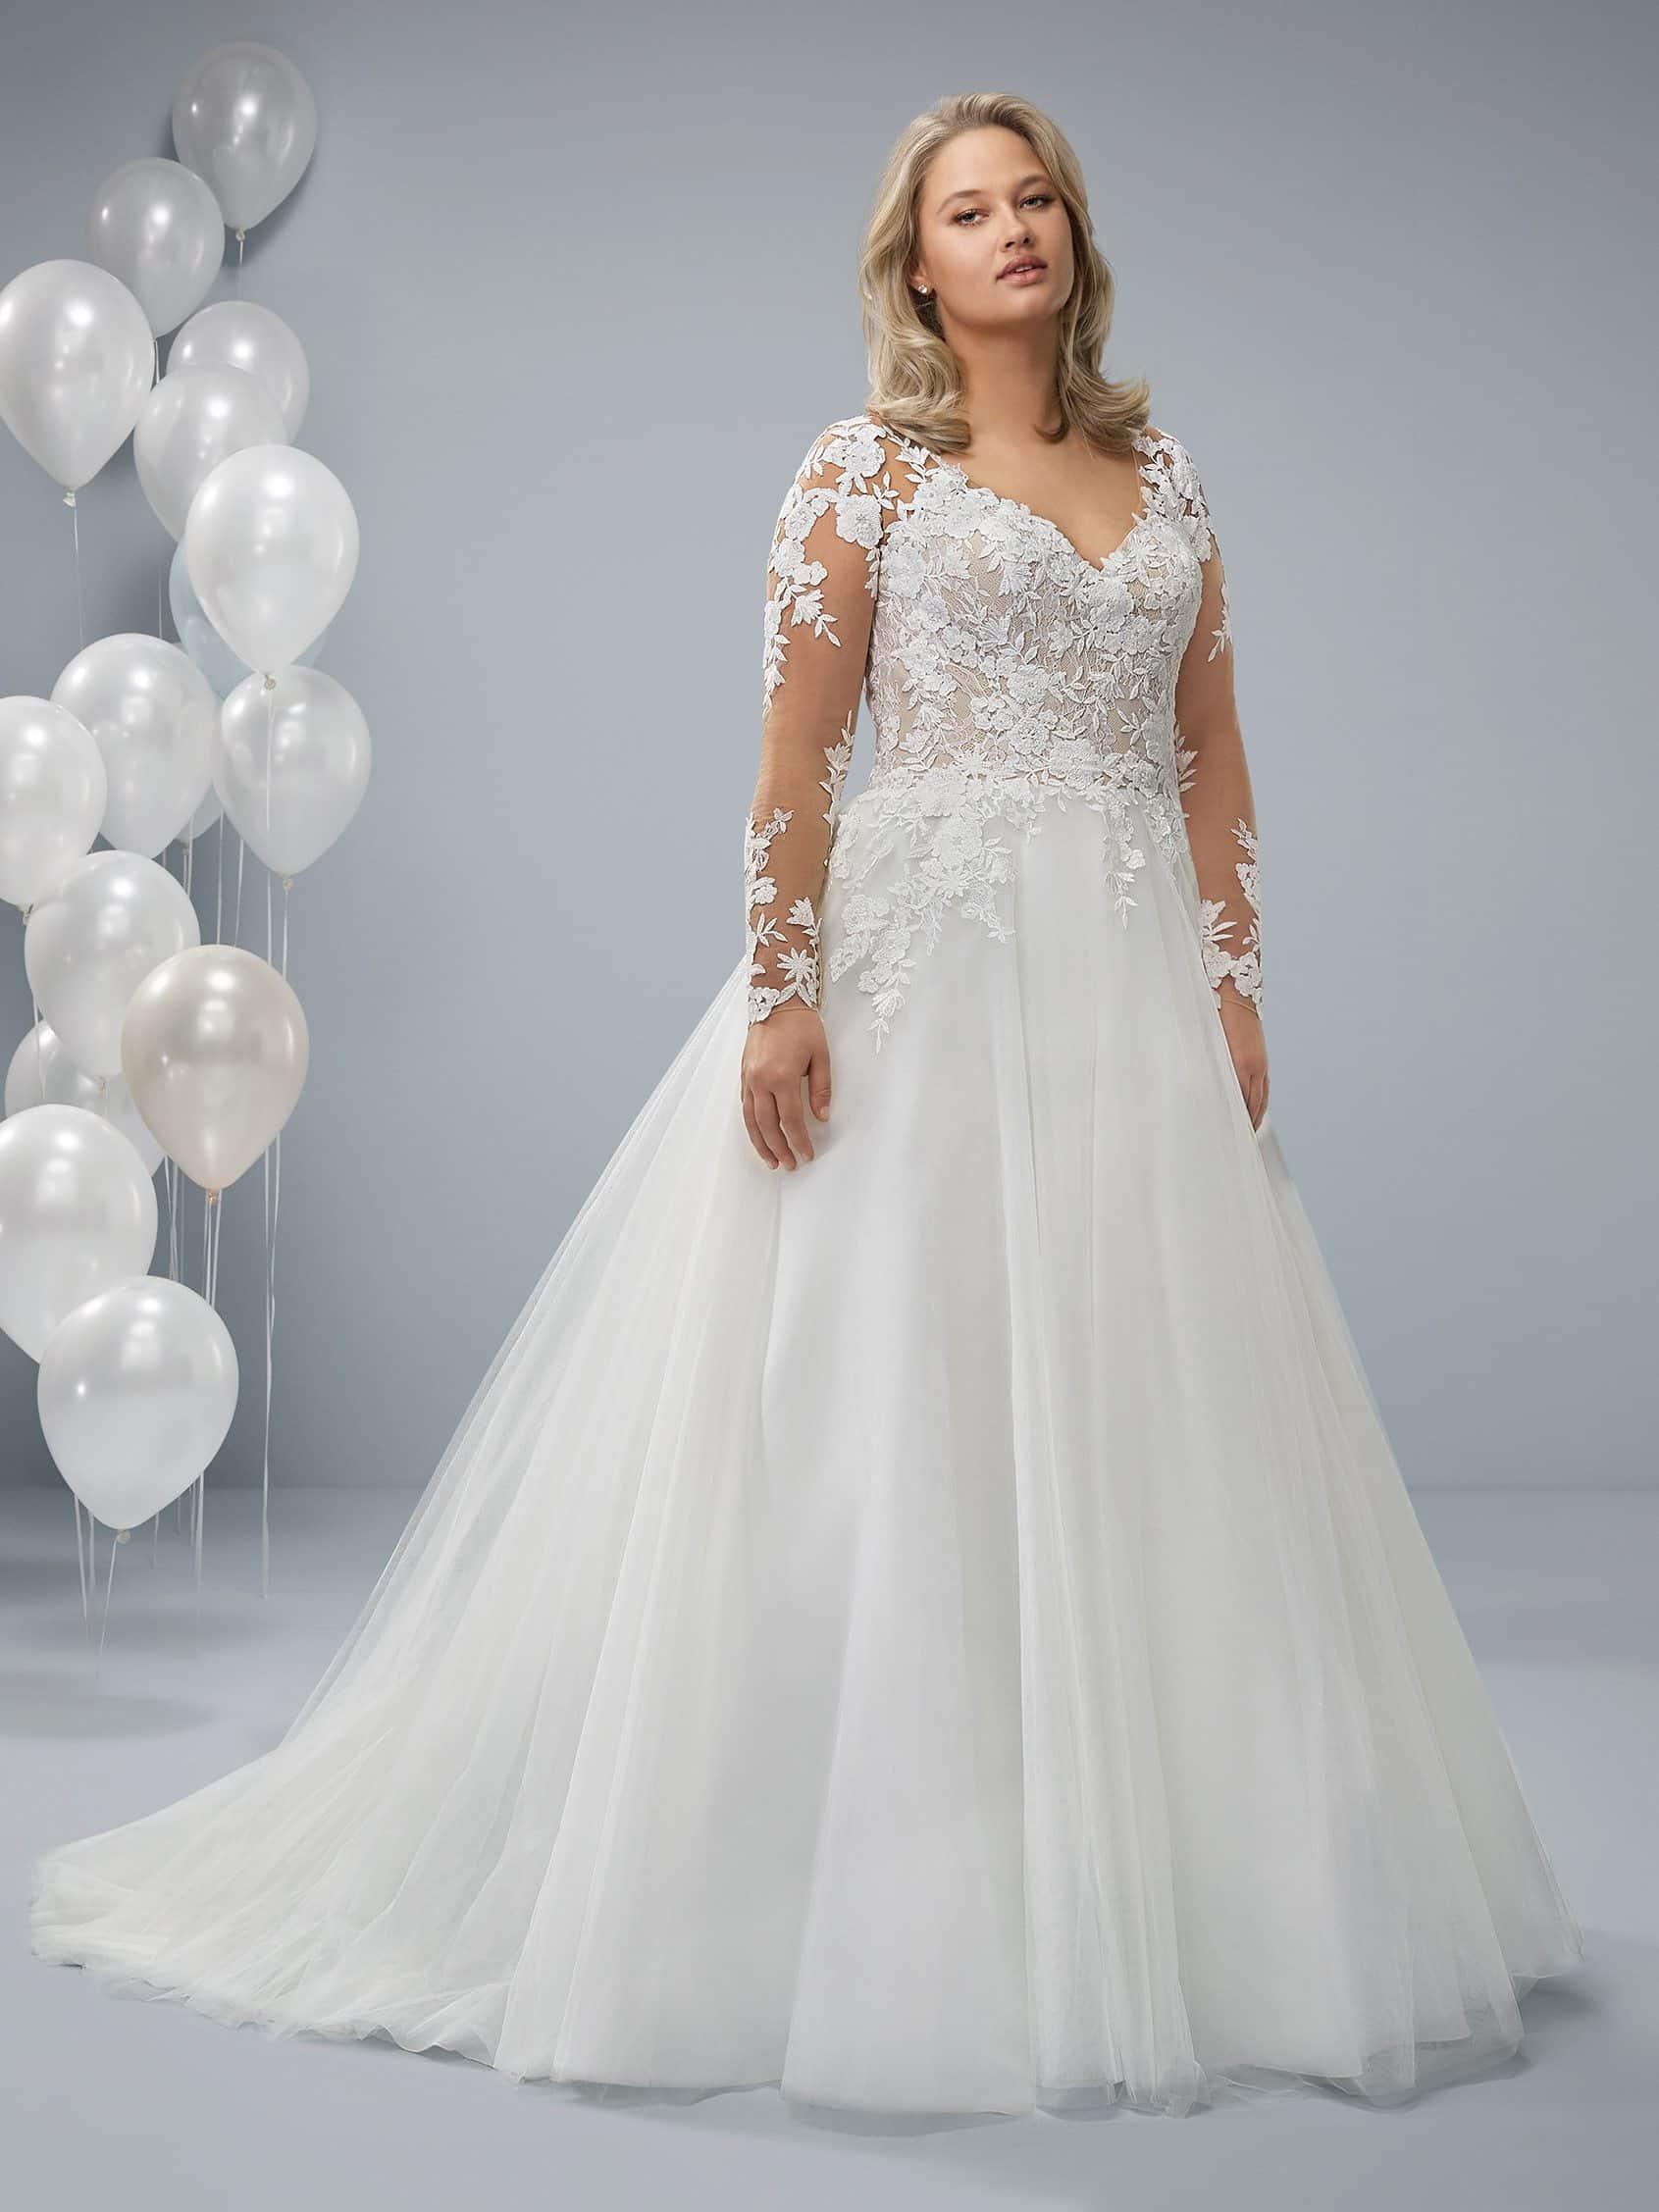 ff5edf92ea4 ODRY PLUS Wedding Dress White one Collection 2019 Paris Boutique